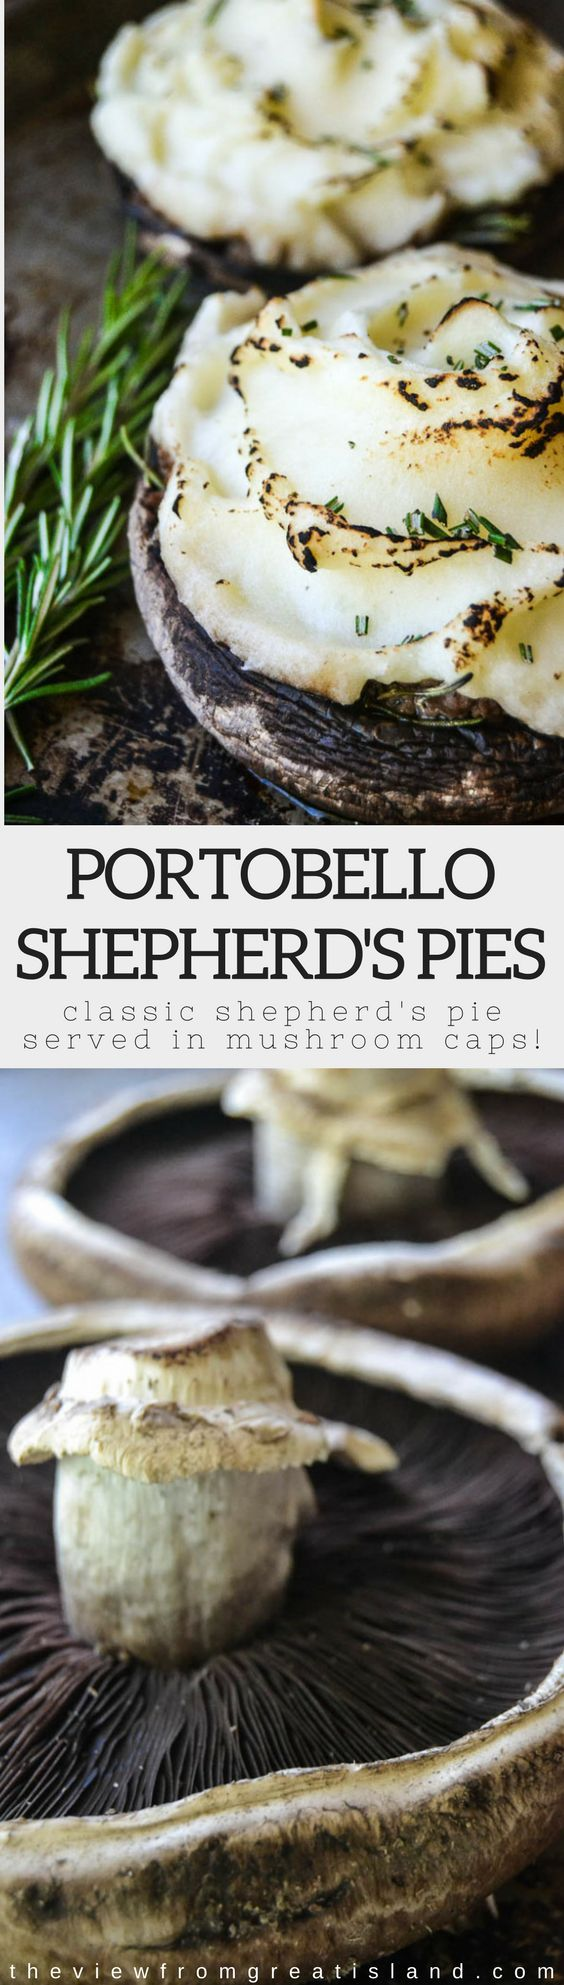 Portobello Shepherd's Pies | Posted By: DebbieNet.com